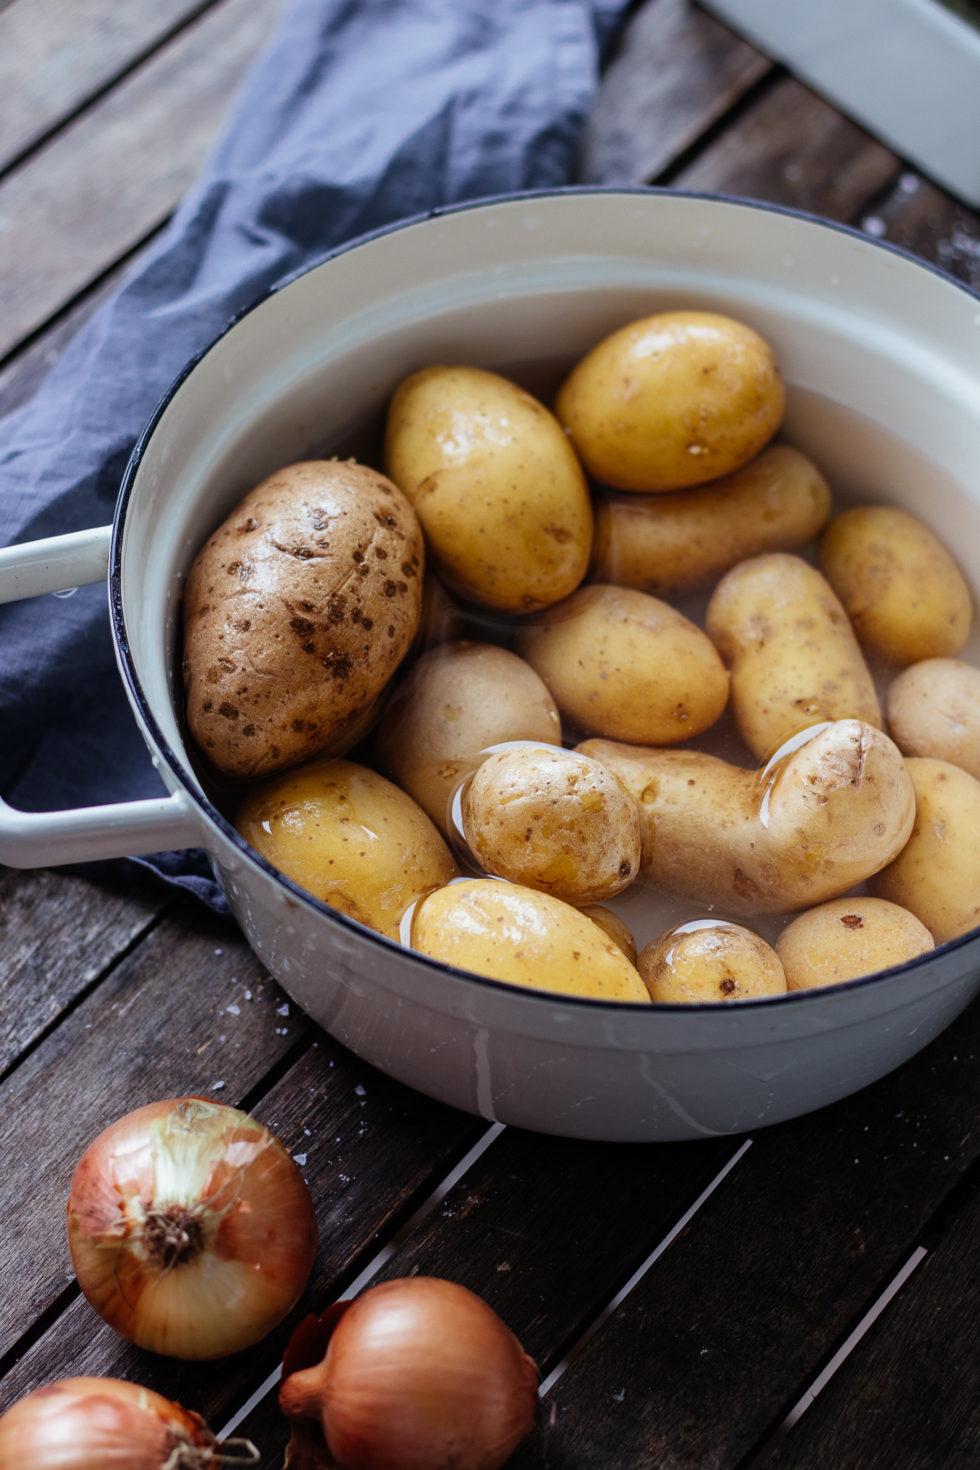 Kartoffel Linsen Eintopf Quarantäne RezeptKartoffel Linsen Eintopf Quarantäne Rezept